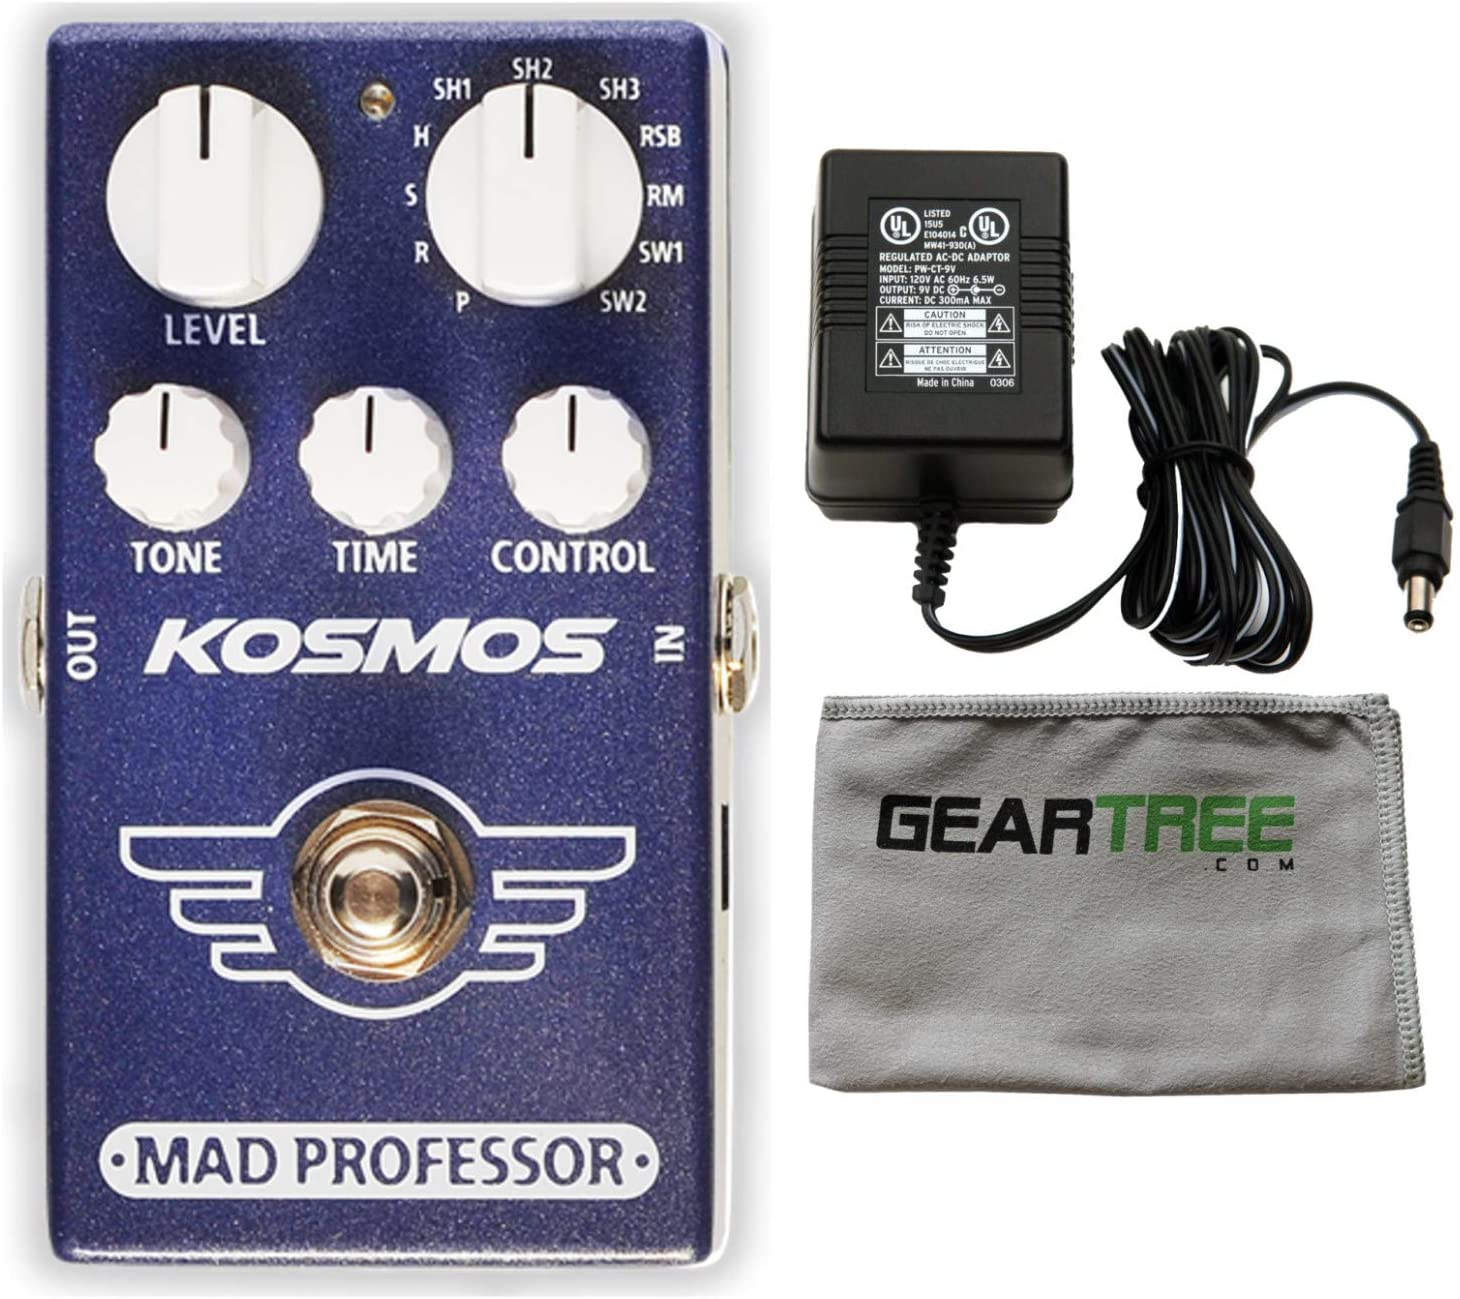 MAD 교수 코스모스 리버브 이펙트 페달 번들(전원 공급 장치 및 천 포함)